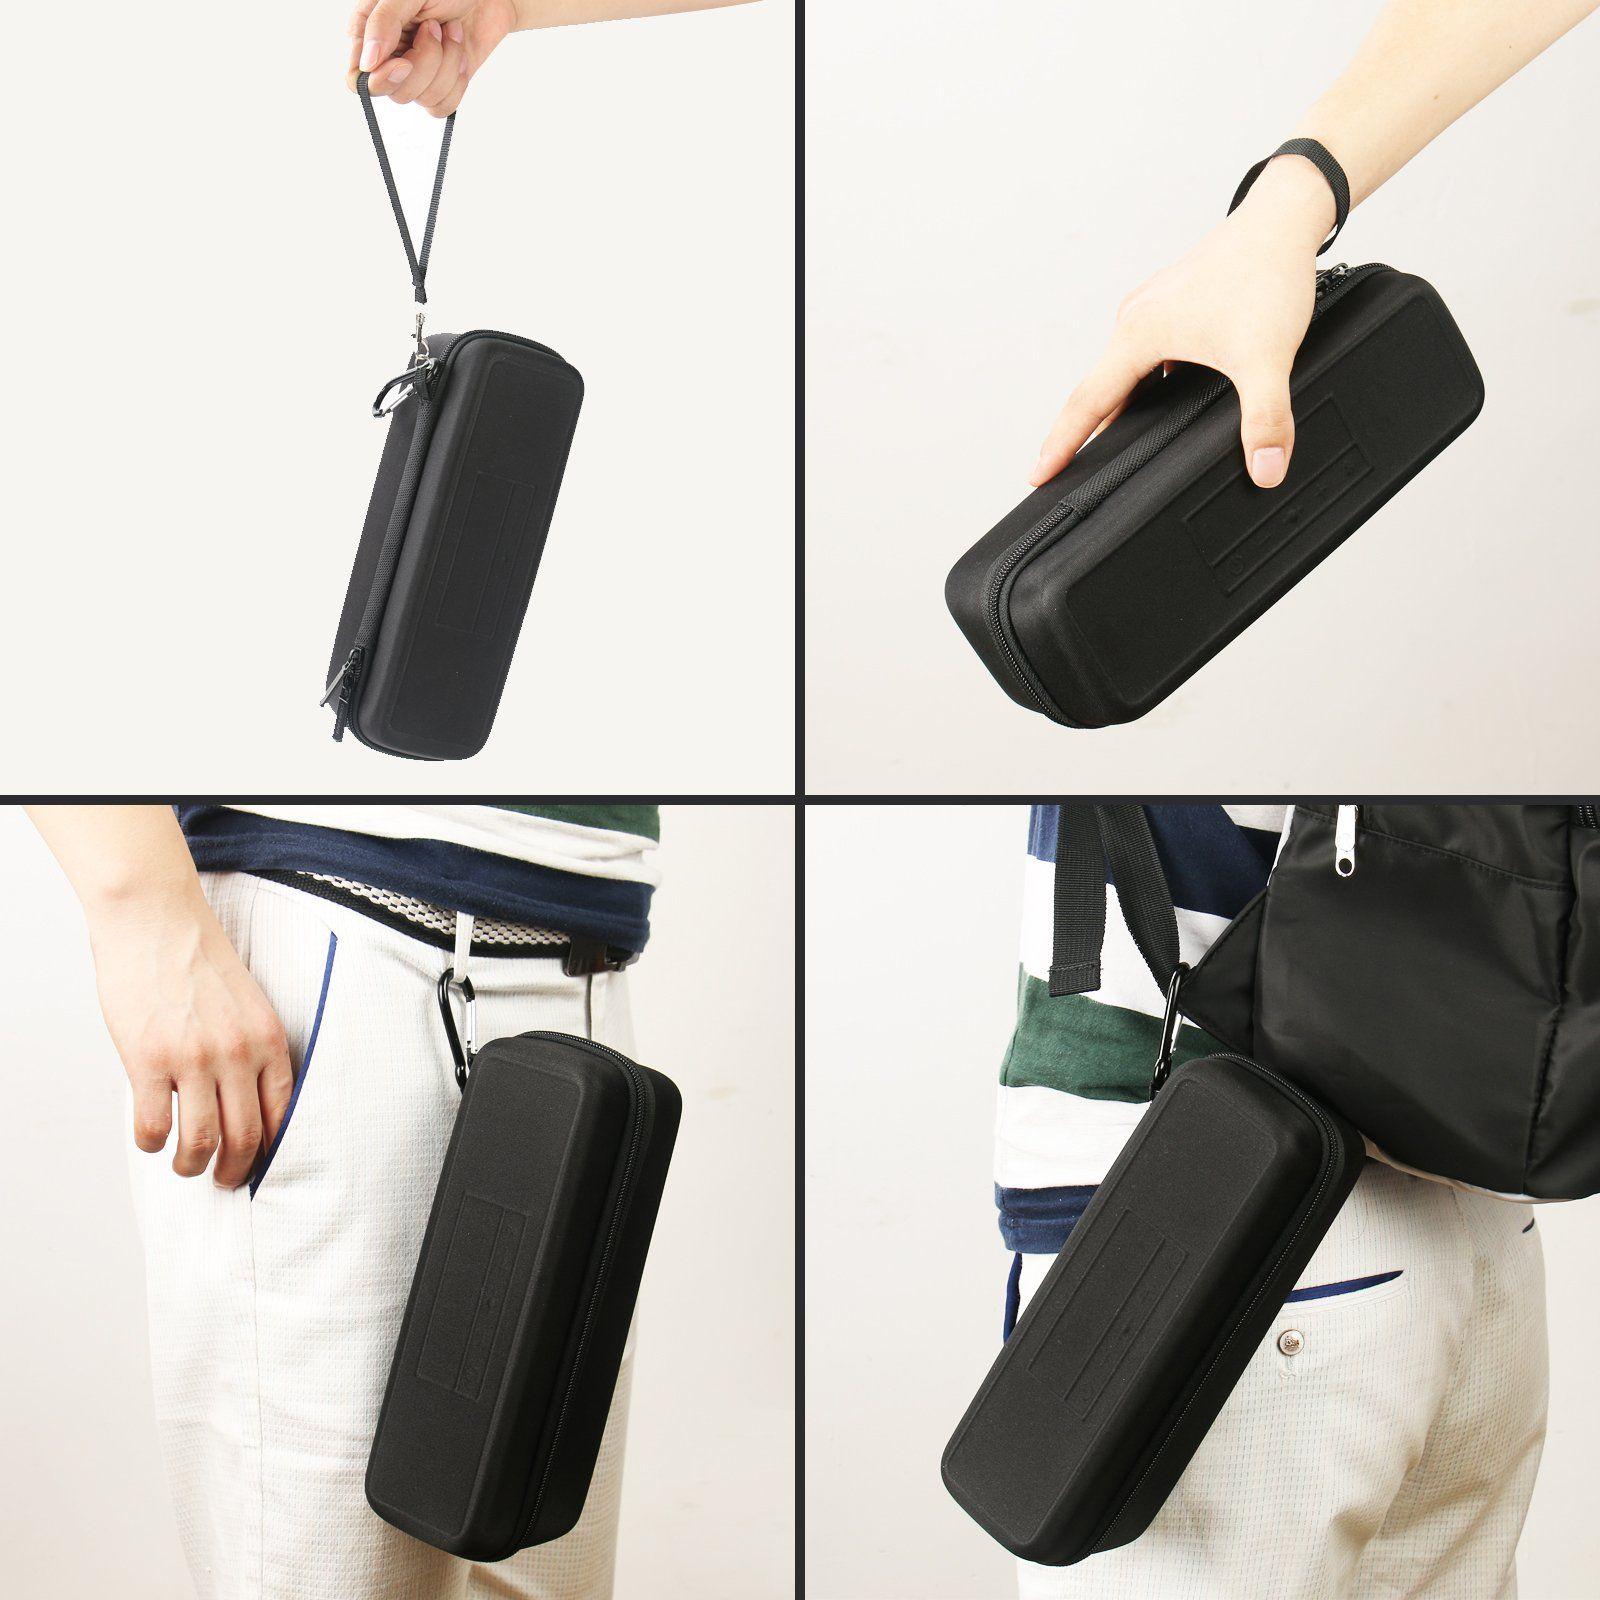 Travel Hard Case Cover For Bose Soundlink Mini Mini 2 Bluetooth Portable Wireless Wireless Speakers Bluetooth Wireless Speakers Portable Bose Soundlink Mini